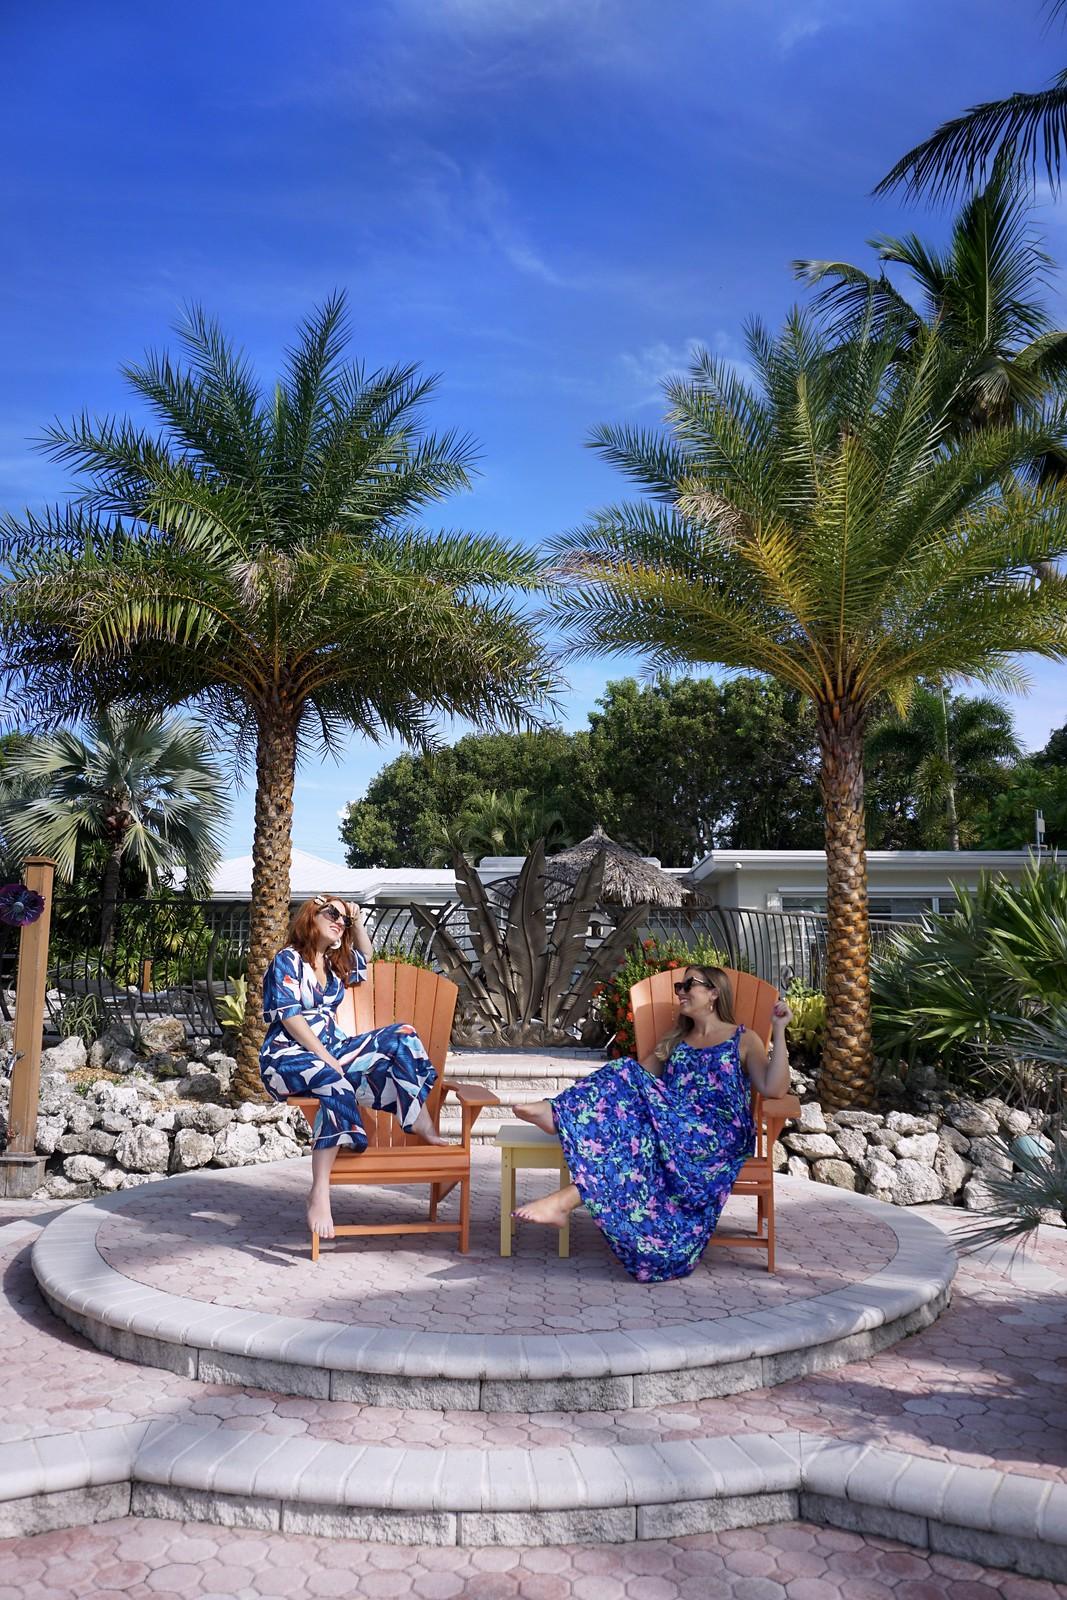 kona-kai-resort-ultimate-road-trip-5-days-florida-keys-itinerary-what-to-do-key-west-key-largo-islamorada-marathon-miami-vacation-guide